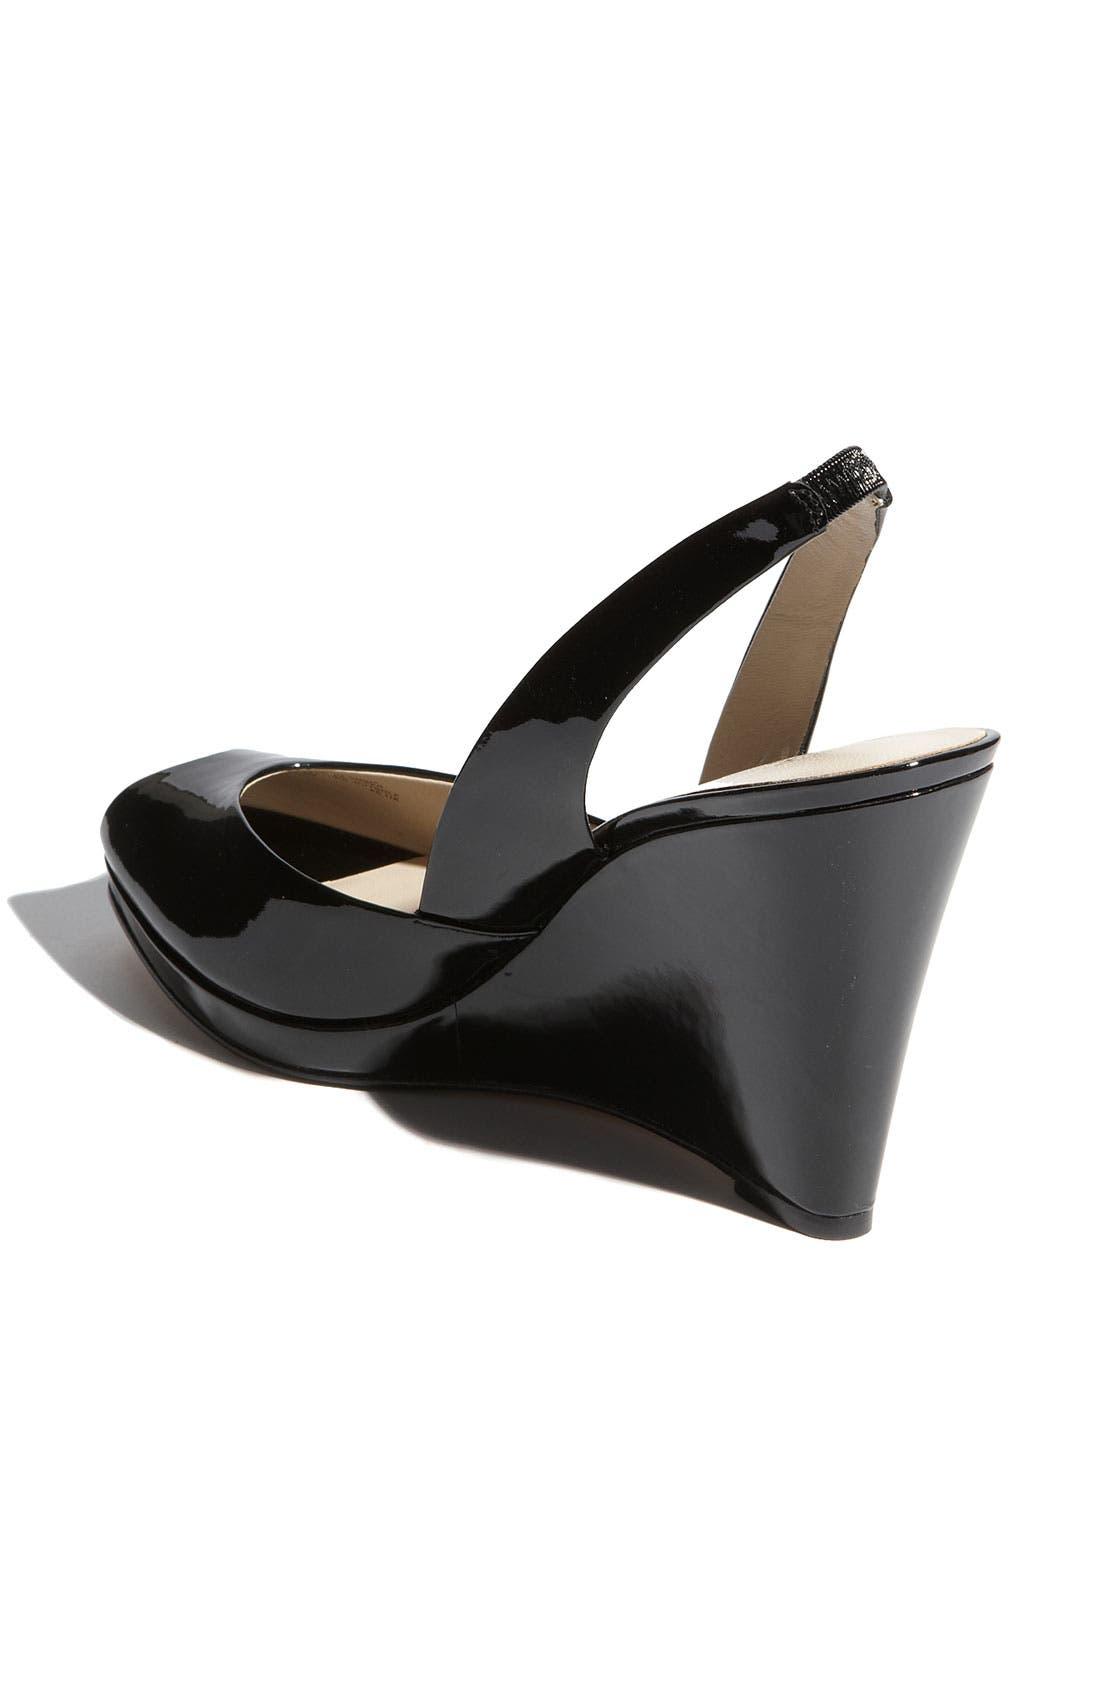 Alternate Image 2  - KORS Michael Kors 'Vivian' Wedge Sandal